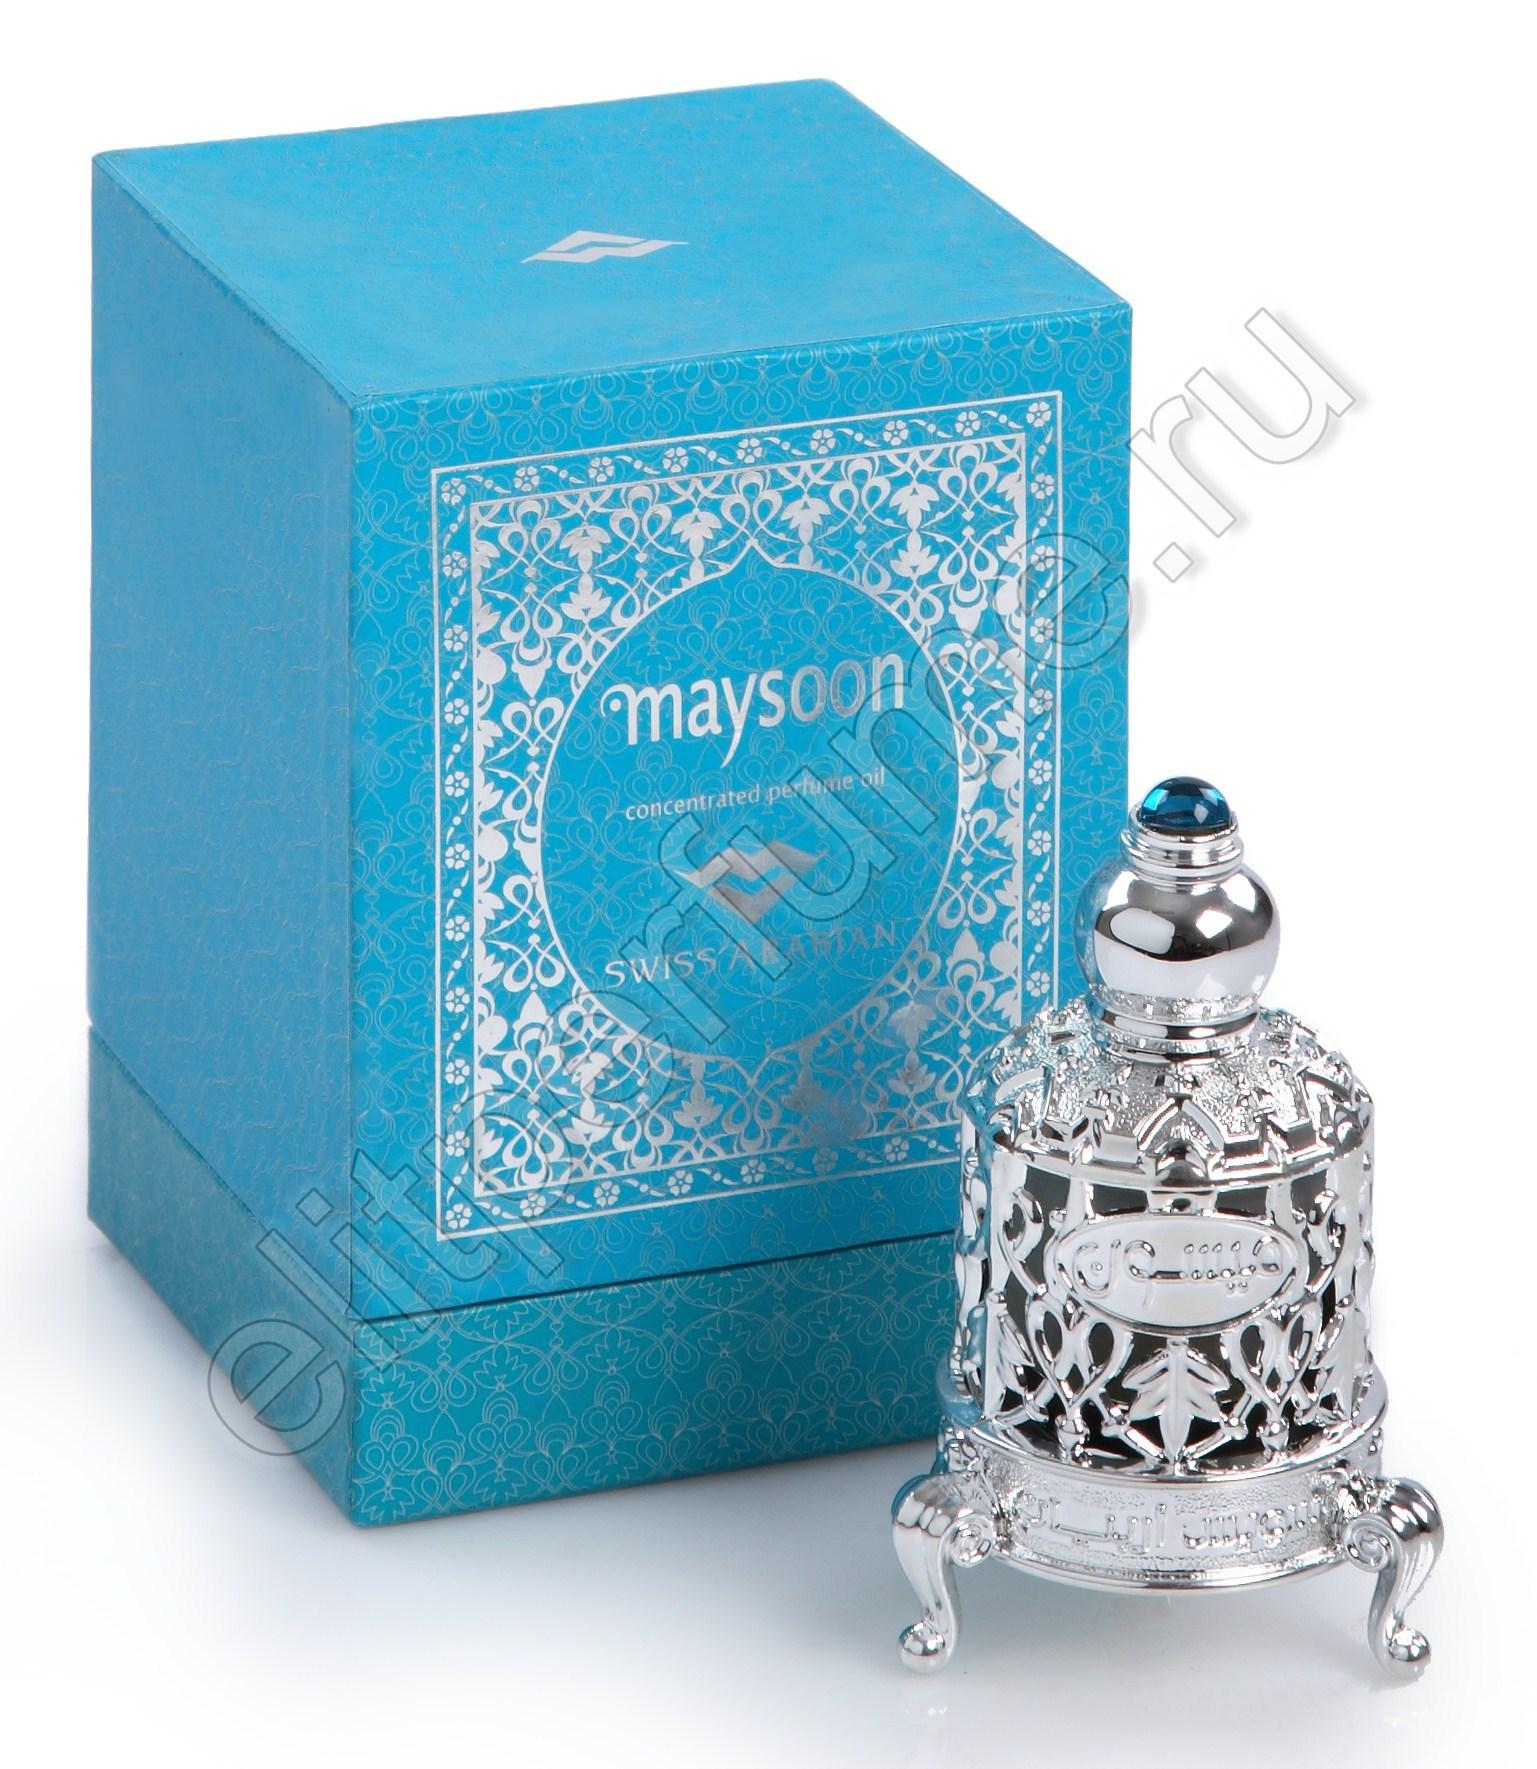 Мэйсун Maysoon 15 мл арабские масляные духи от Свисс Арабиан Swiss Arabian